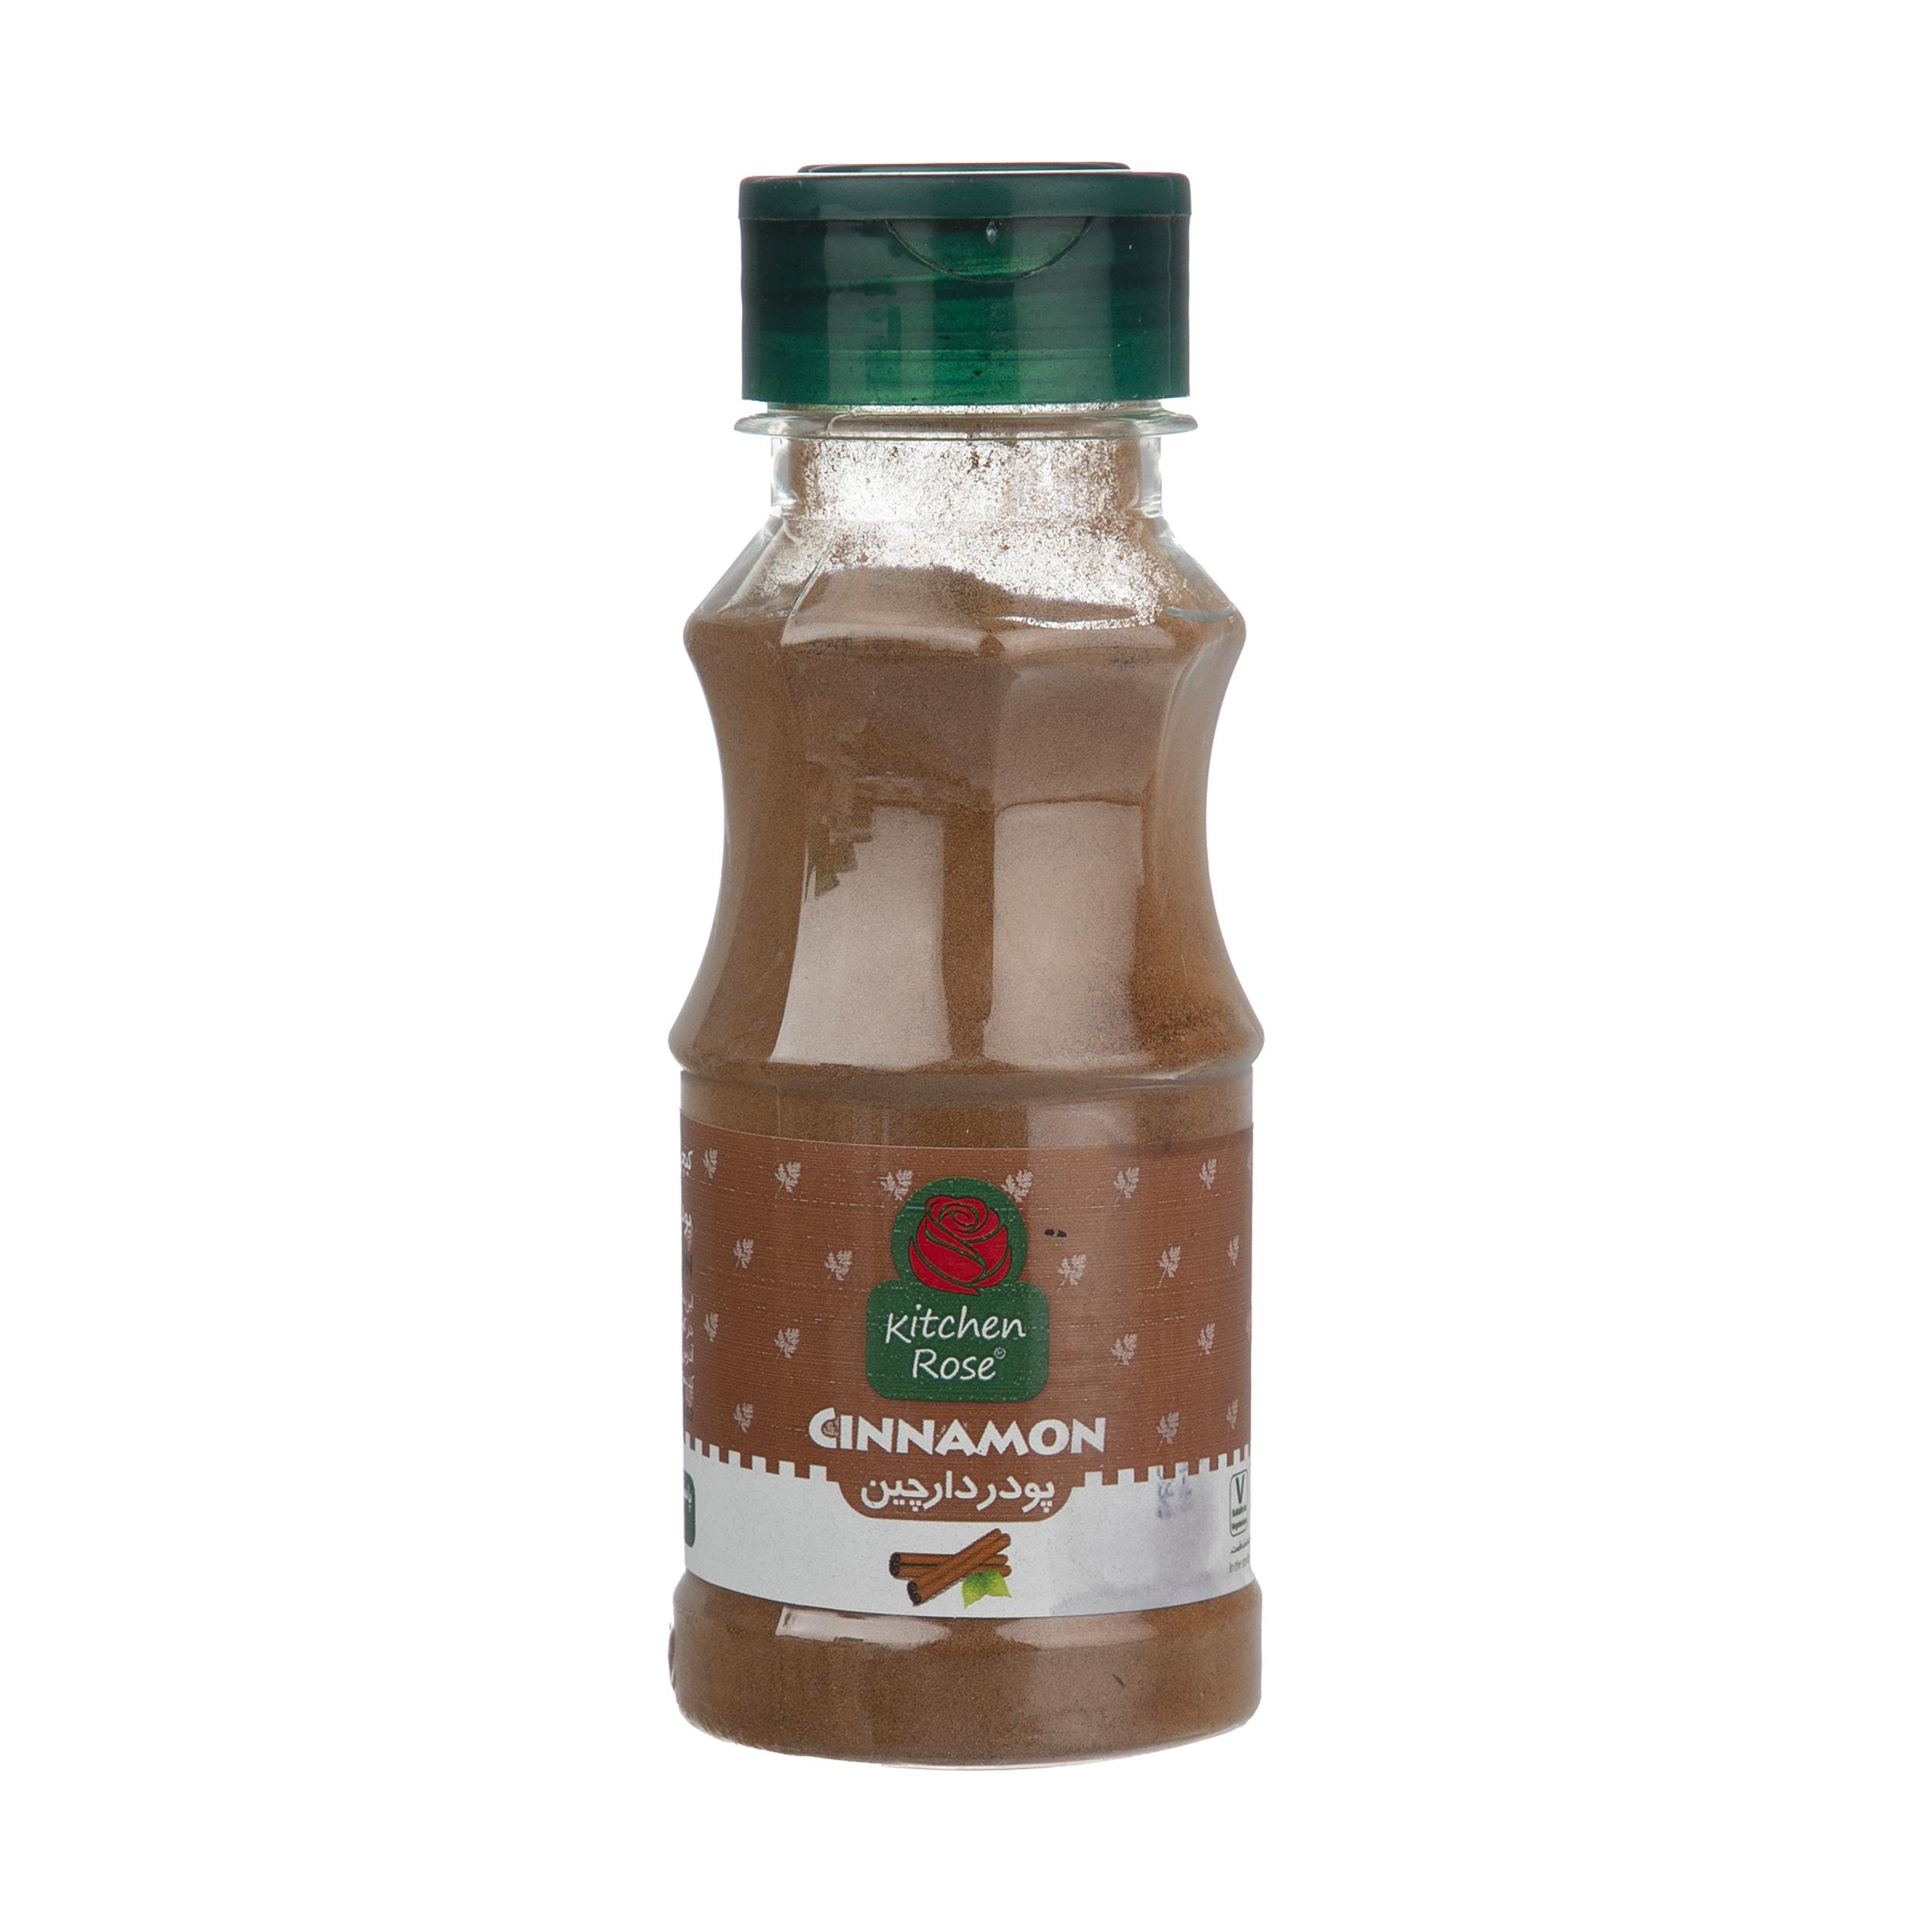 خرید                      پودر سماق کیچن رز - 95 گرم